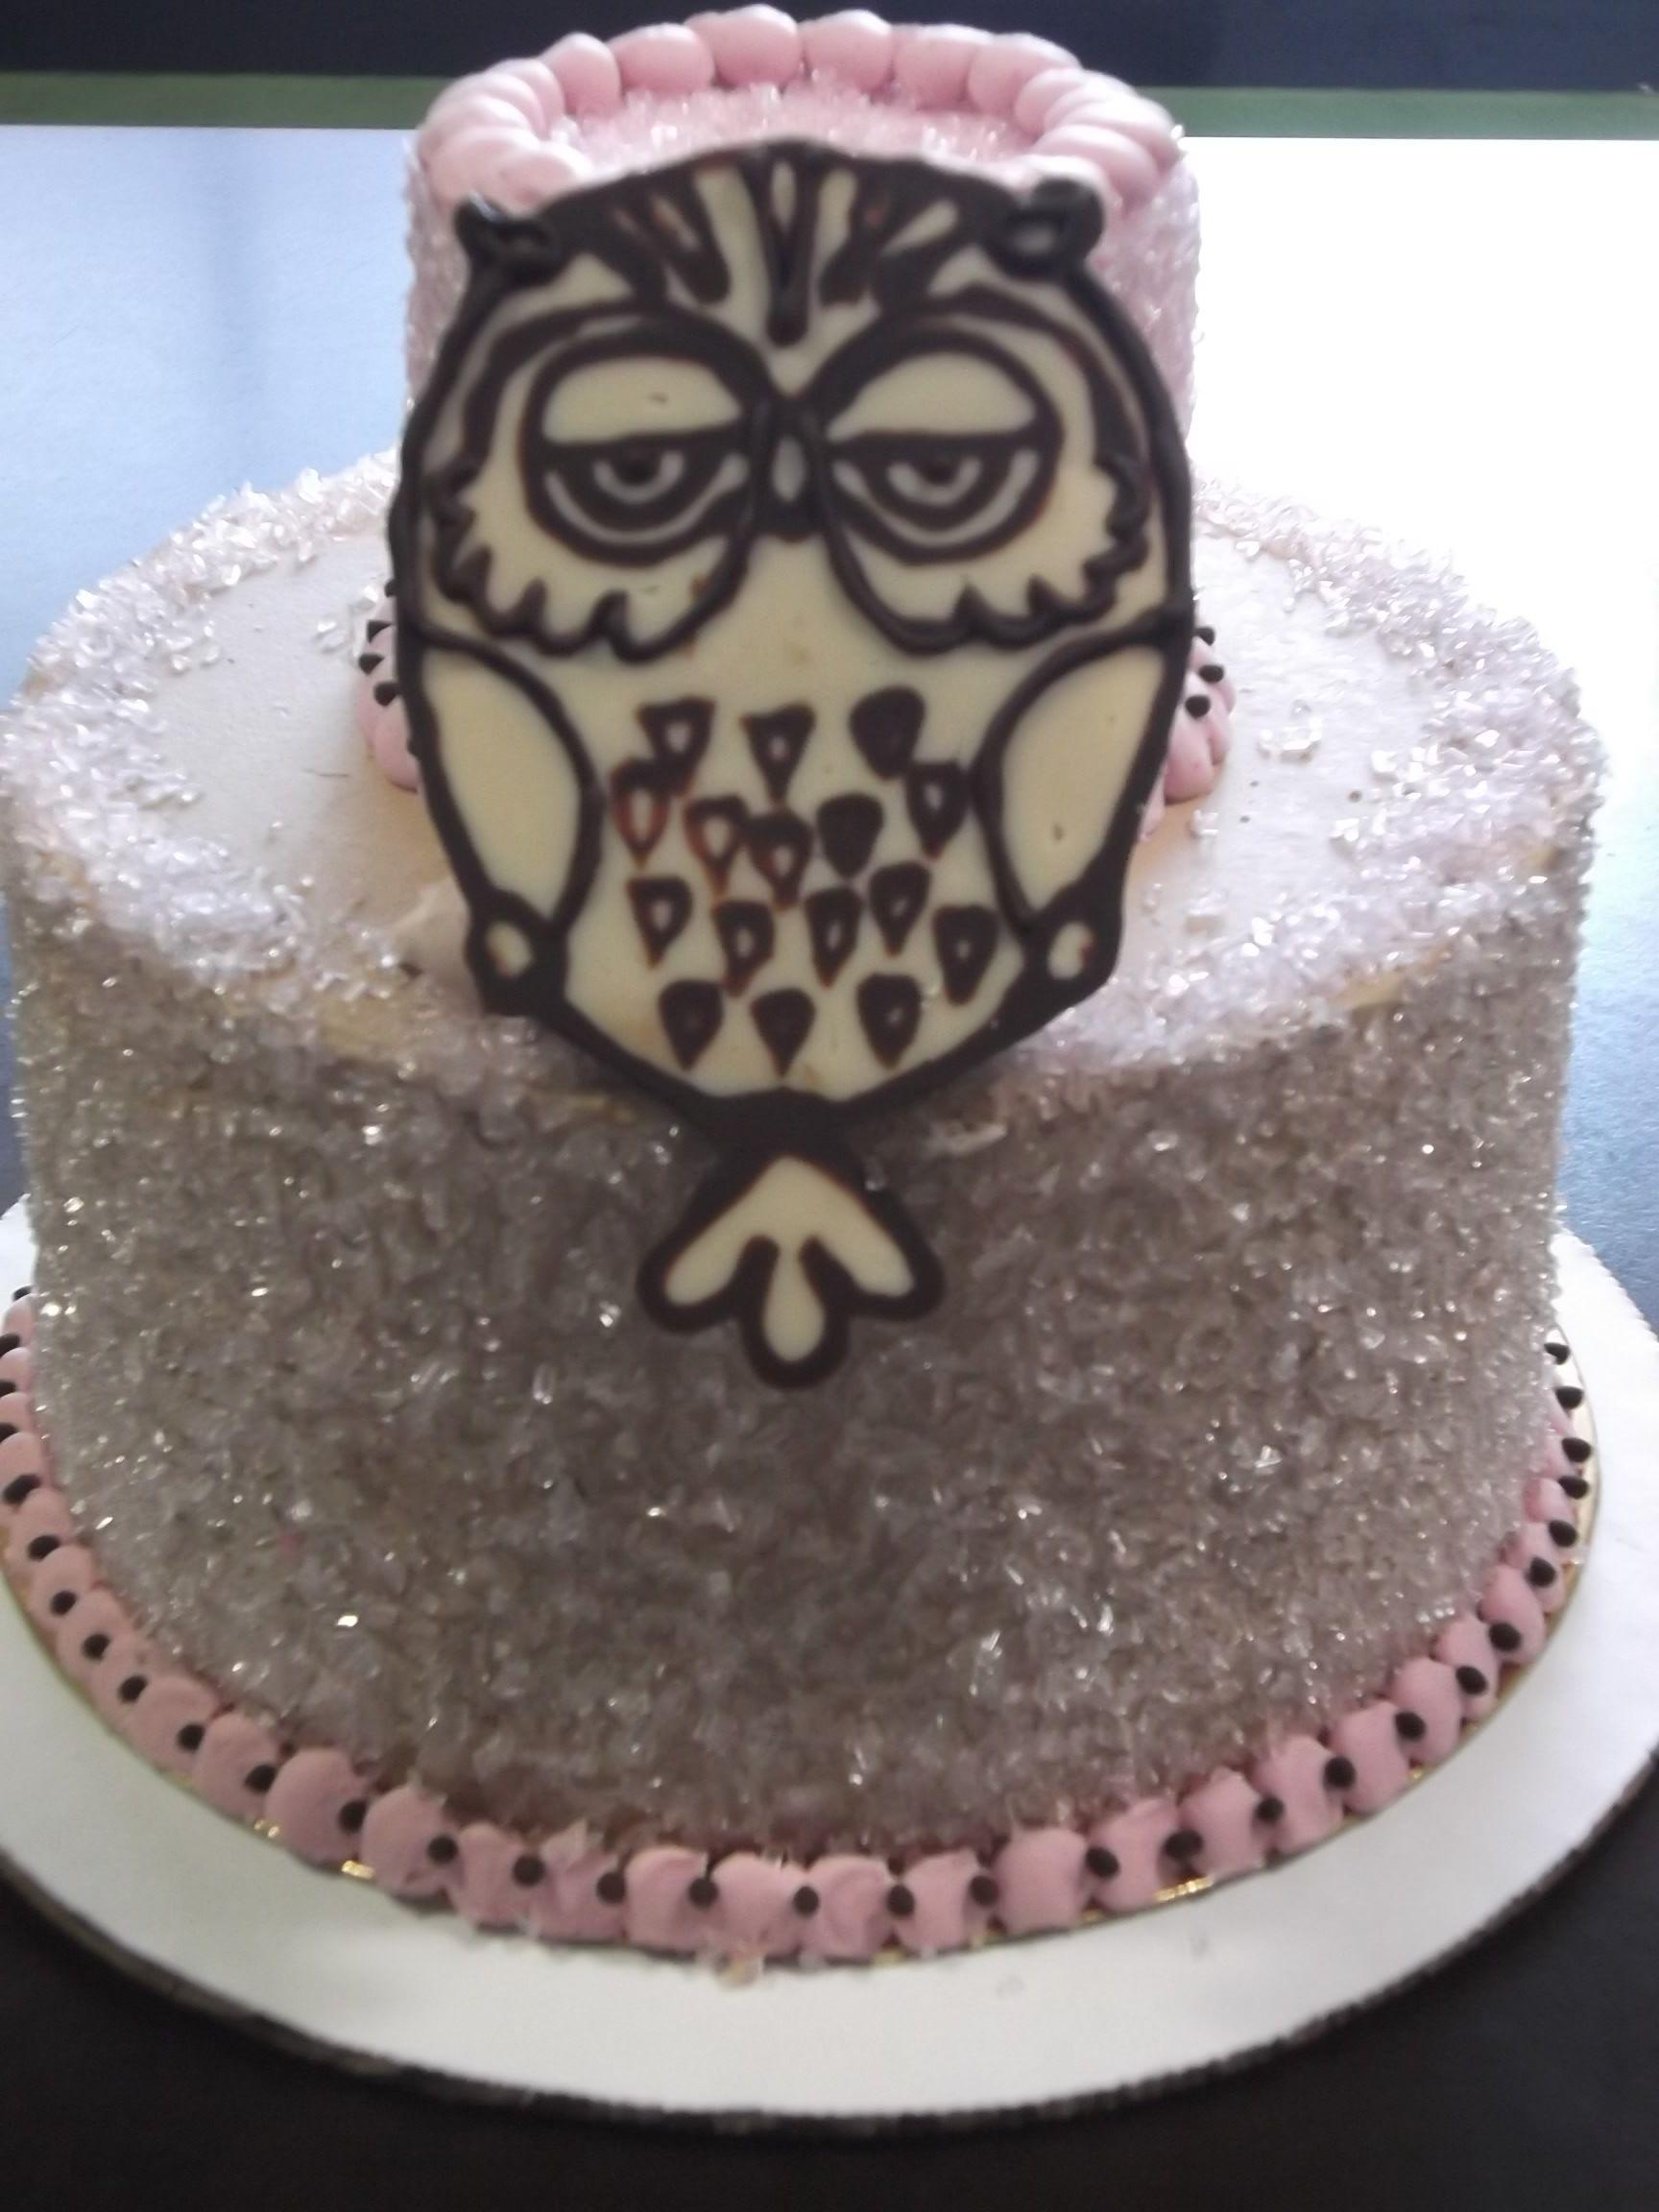 Hoot! Hoot! Cake Flour An all Natural Baking Company